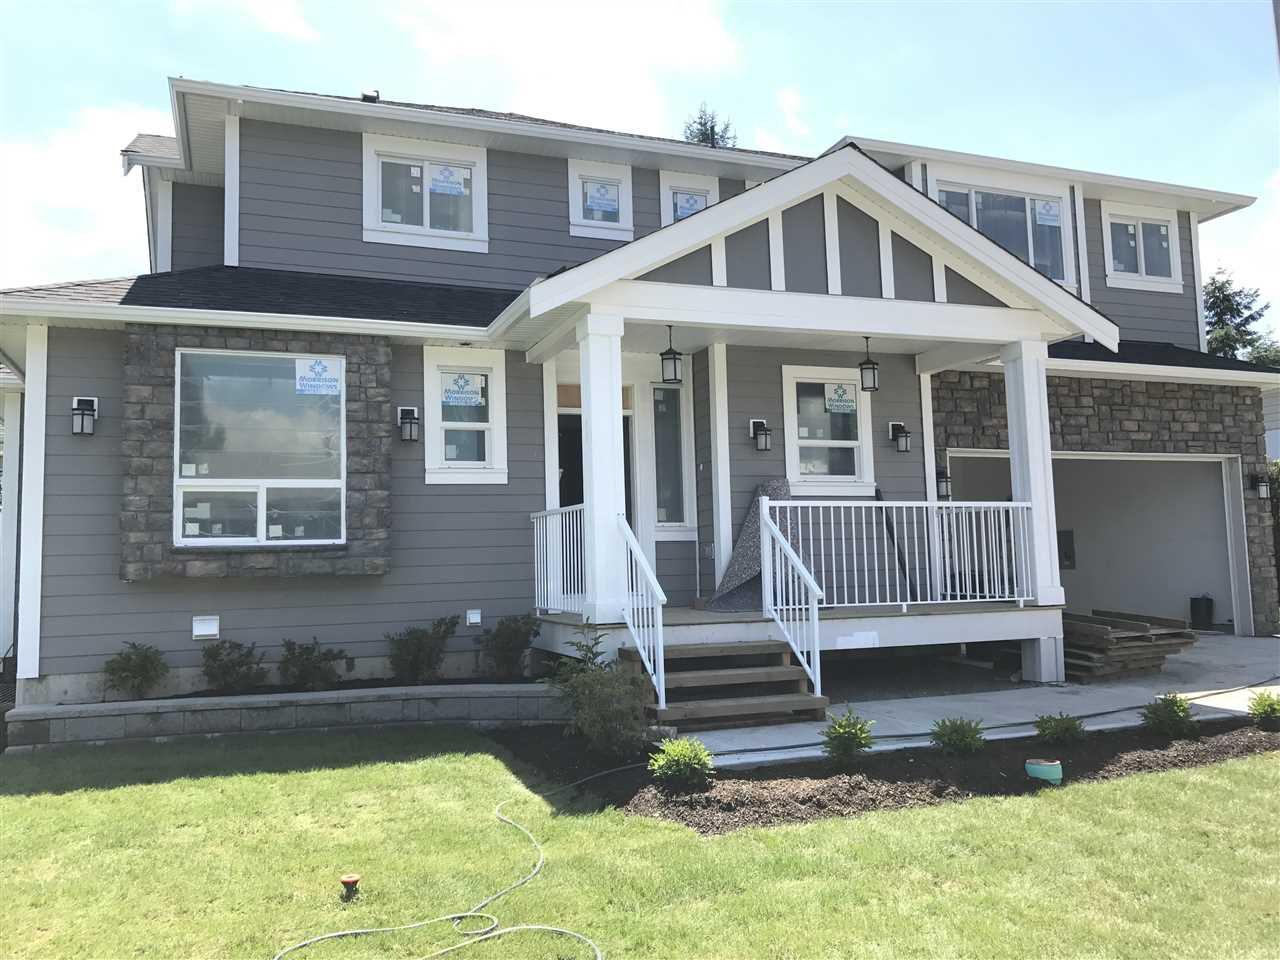 Main Photo: 18918 120B STREET in Pitt Meadows: Central Meadows House 1/2 Duplex for sale : MLS®# R2178159